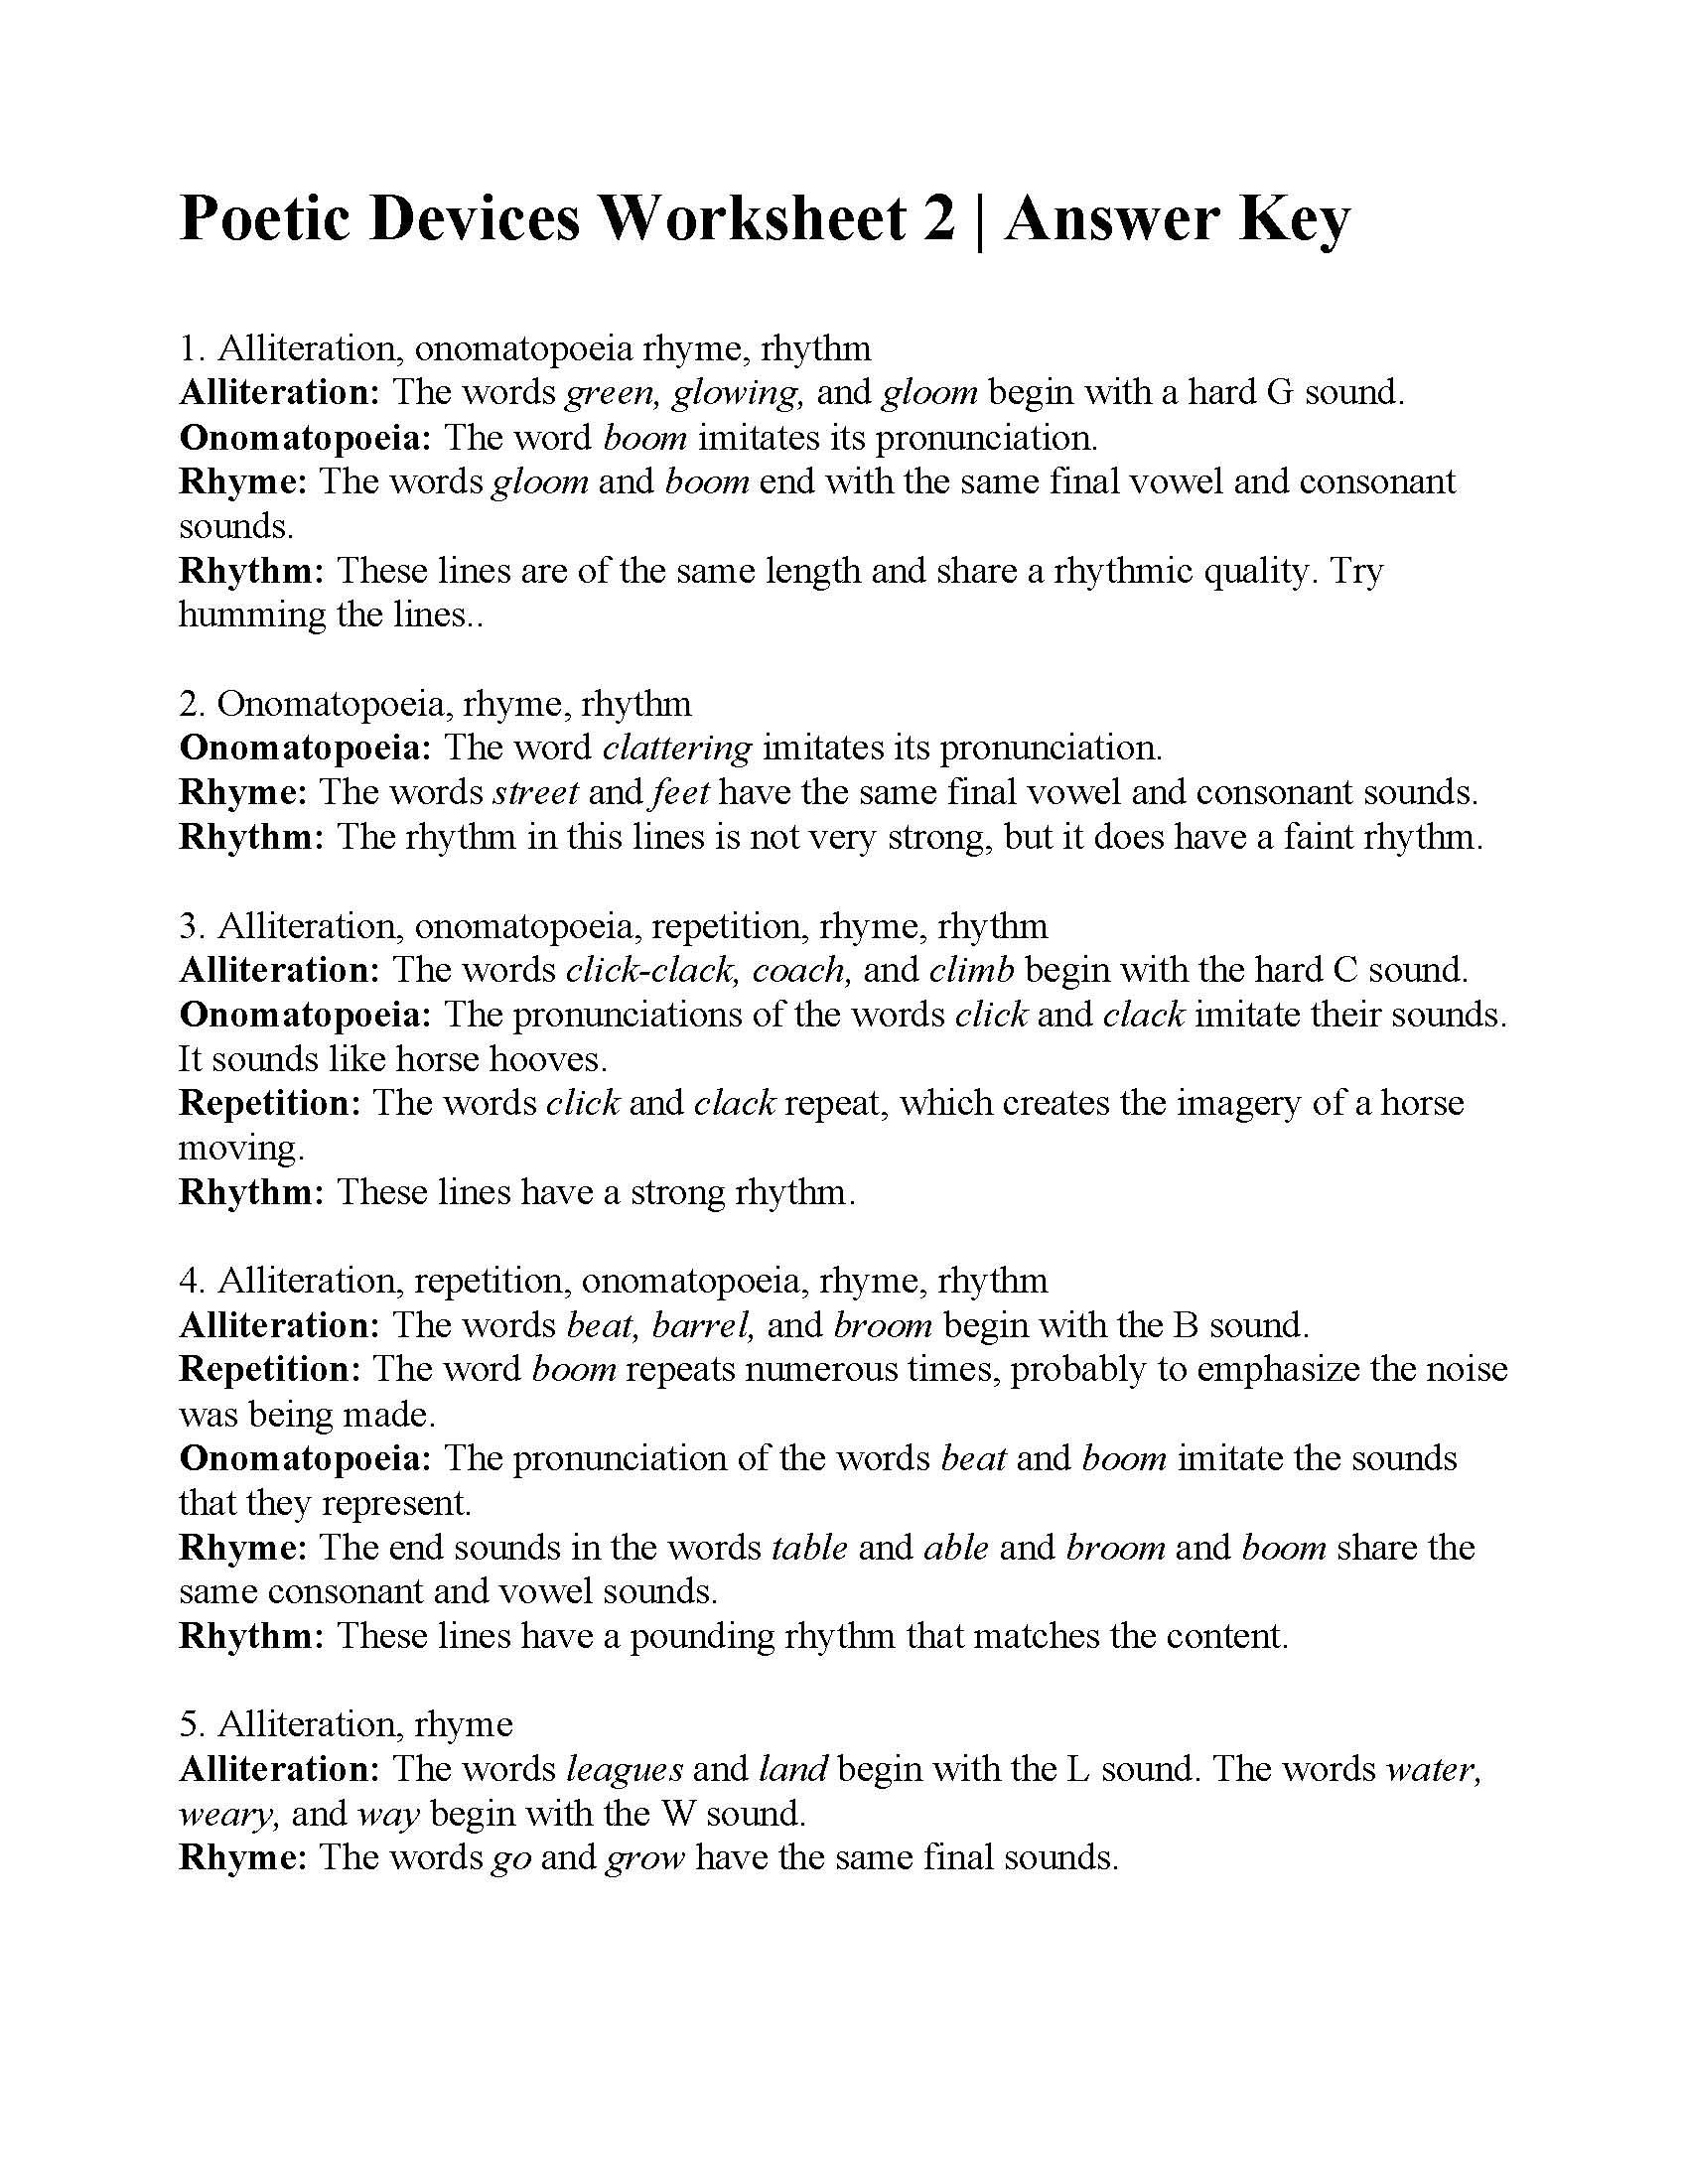 Poetic Devices Worksheet 1